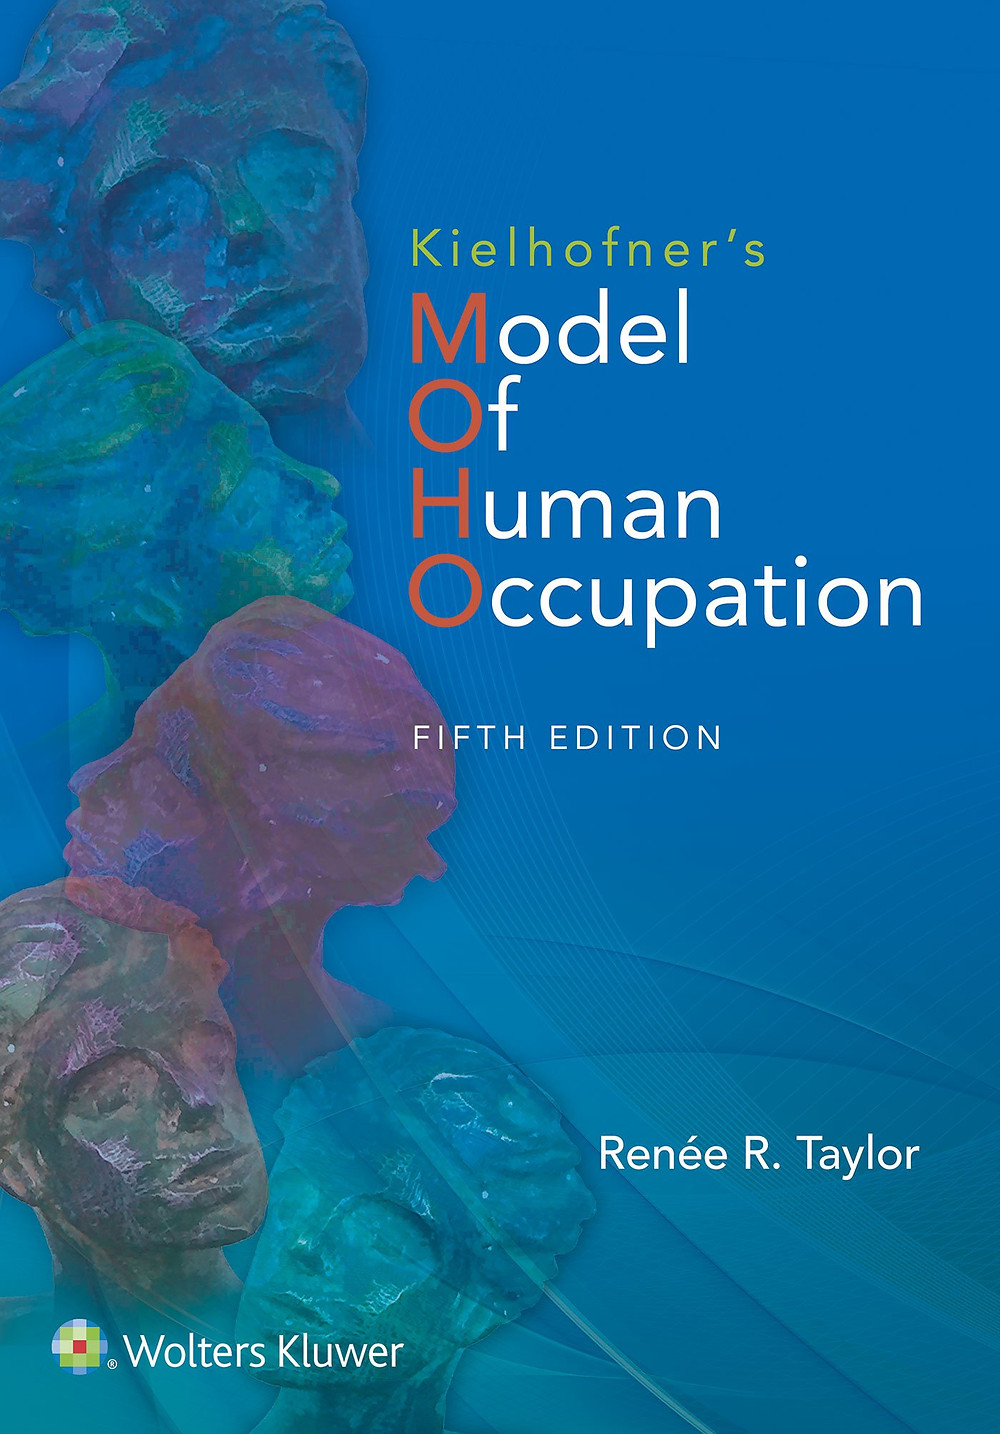 Kielhofner's Model of Human Occupation, By Renee R. Taylor